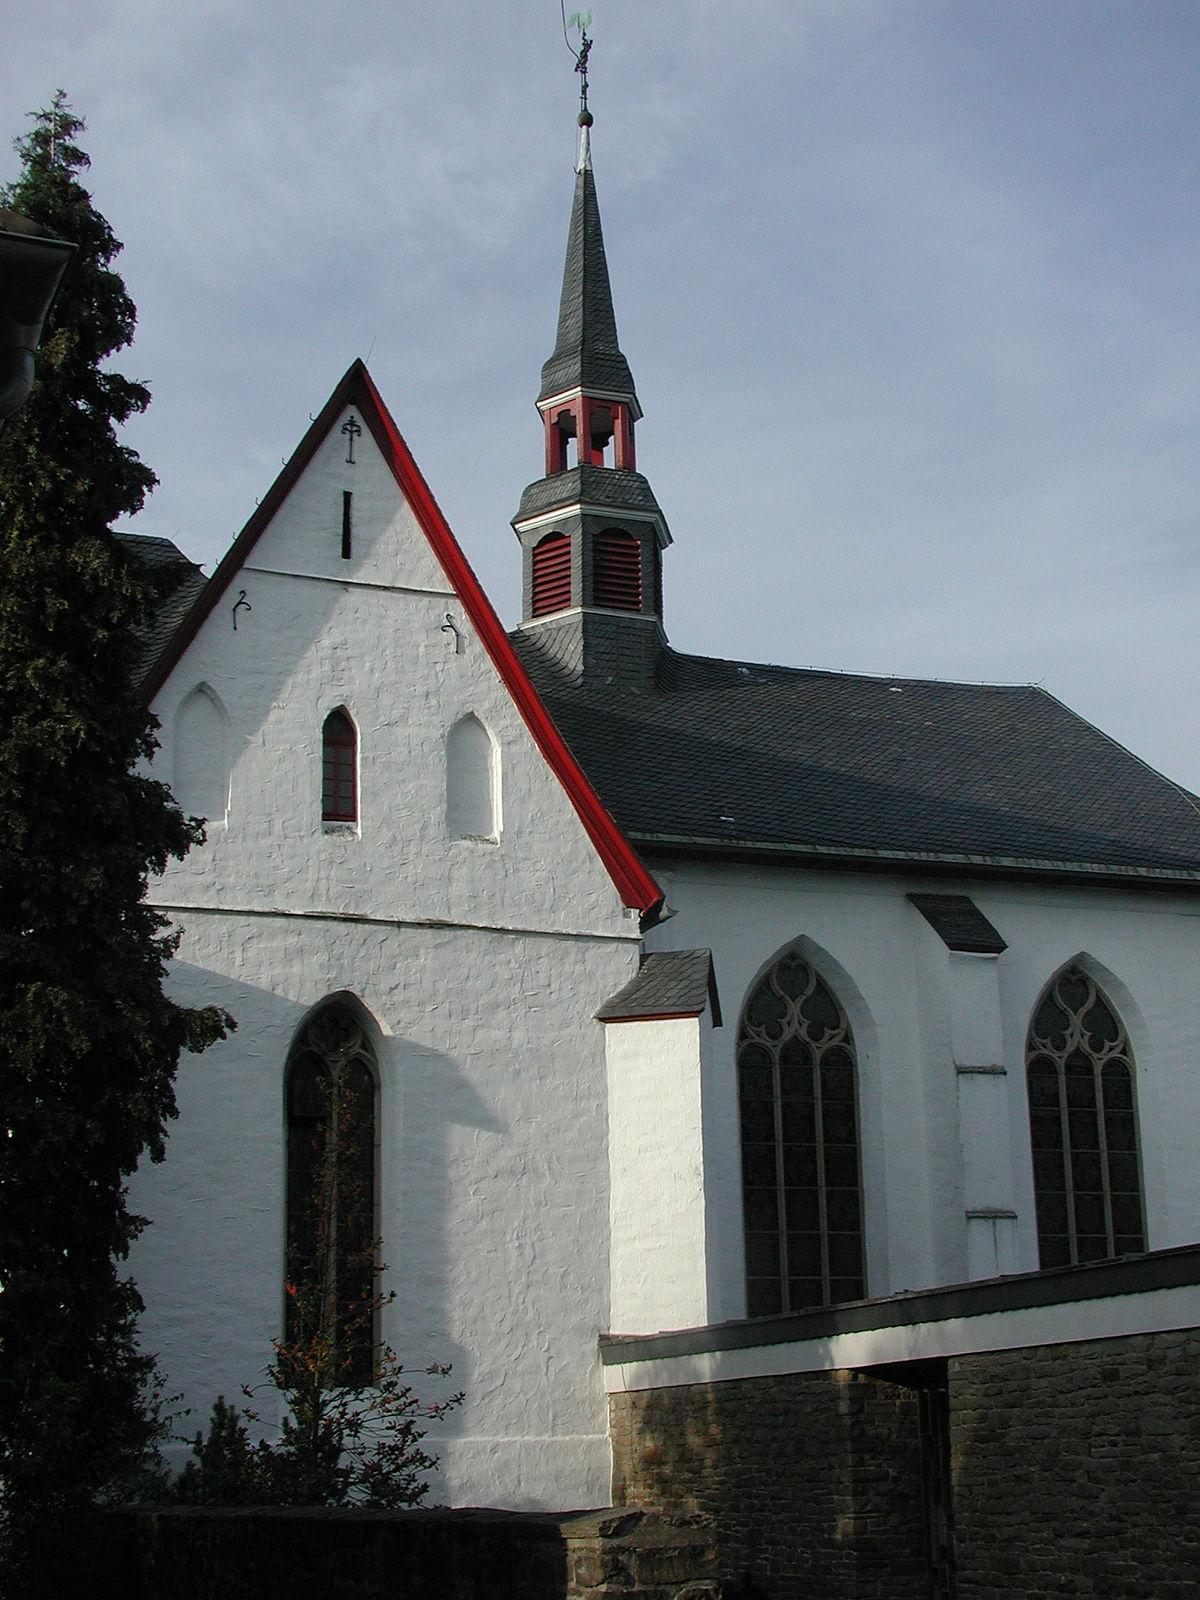 Wallfahrtskirche St. Mariä Heimsuchung (Marienheide